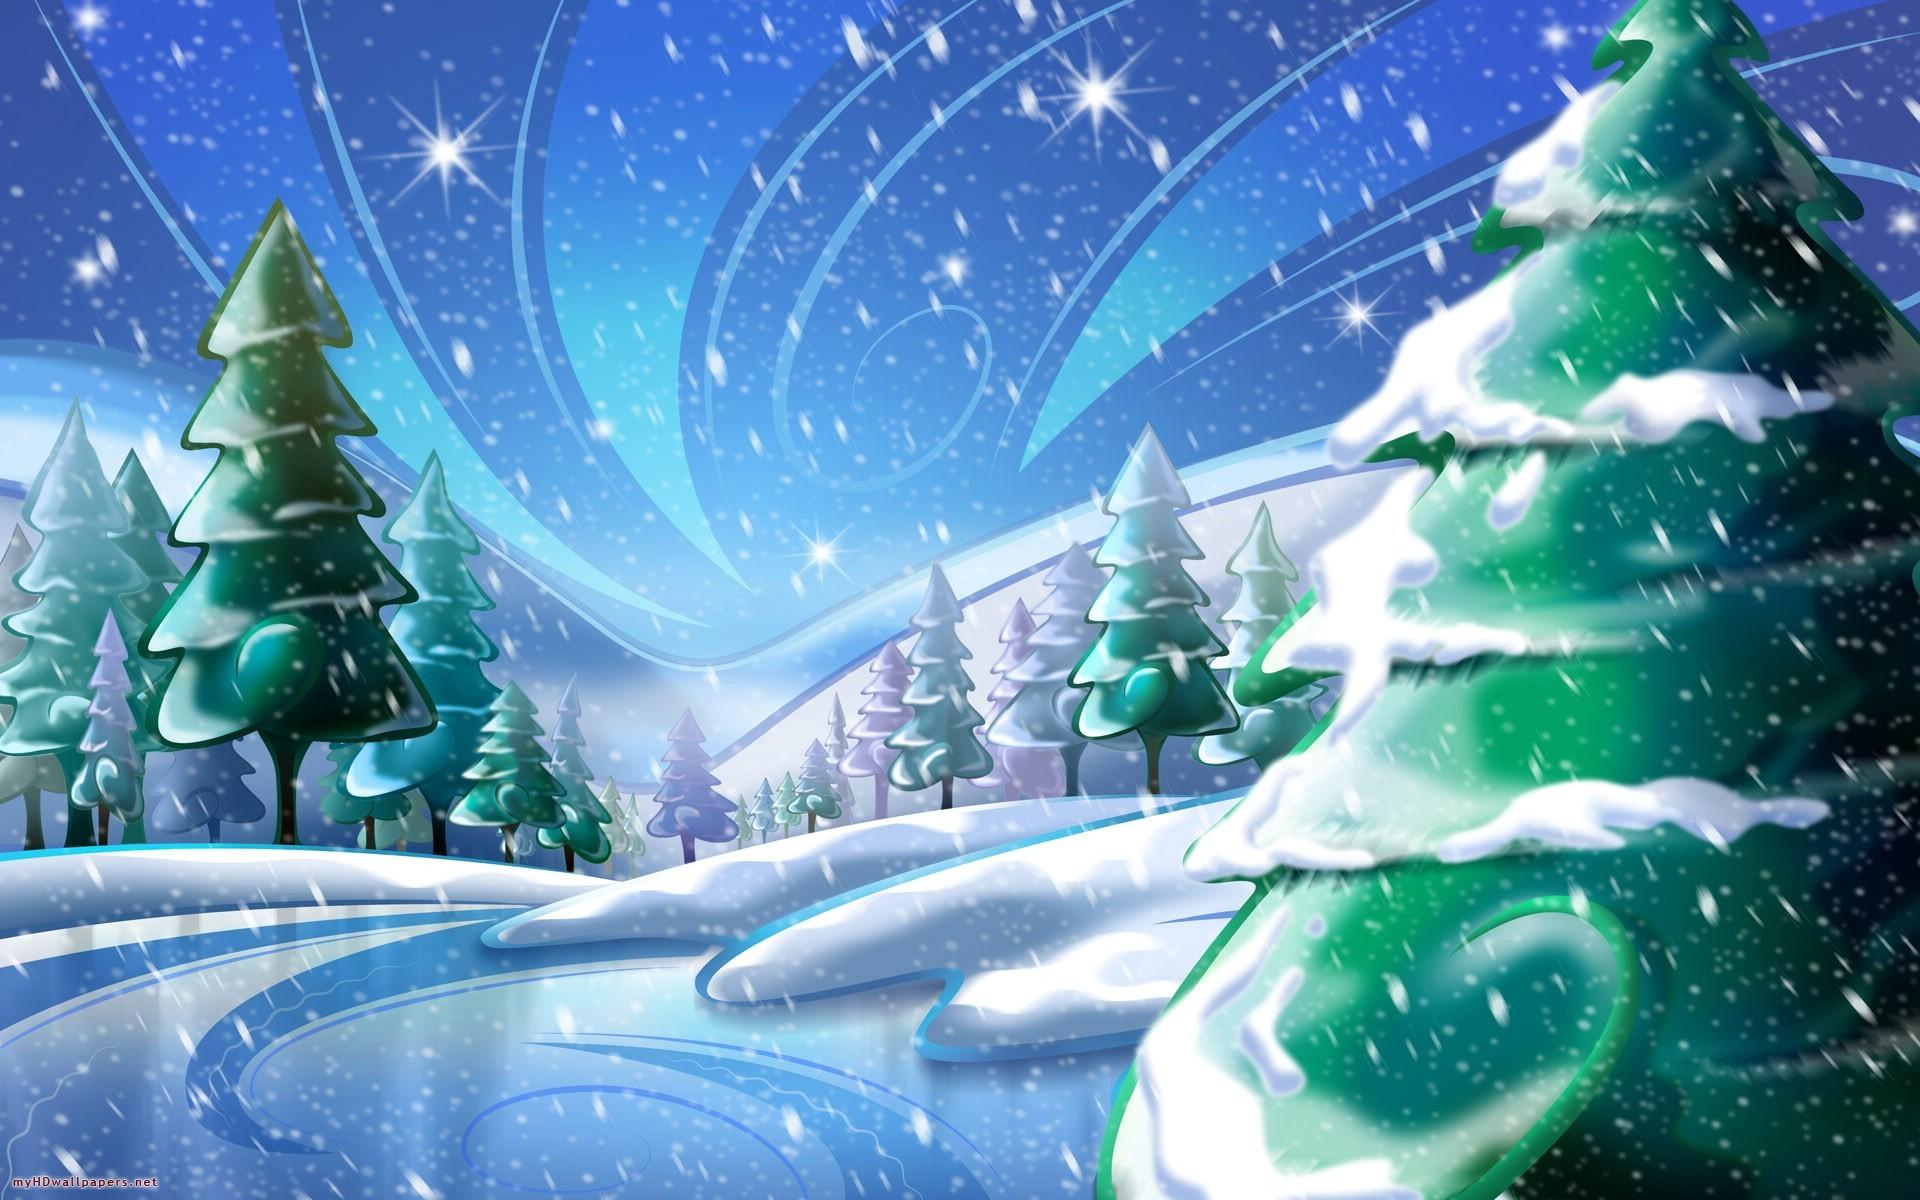 Winter art – Free Desktop Wallpaper, HD Wallpapers Download and New 3D .